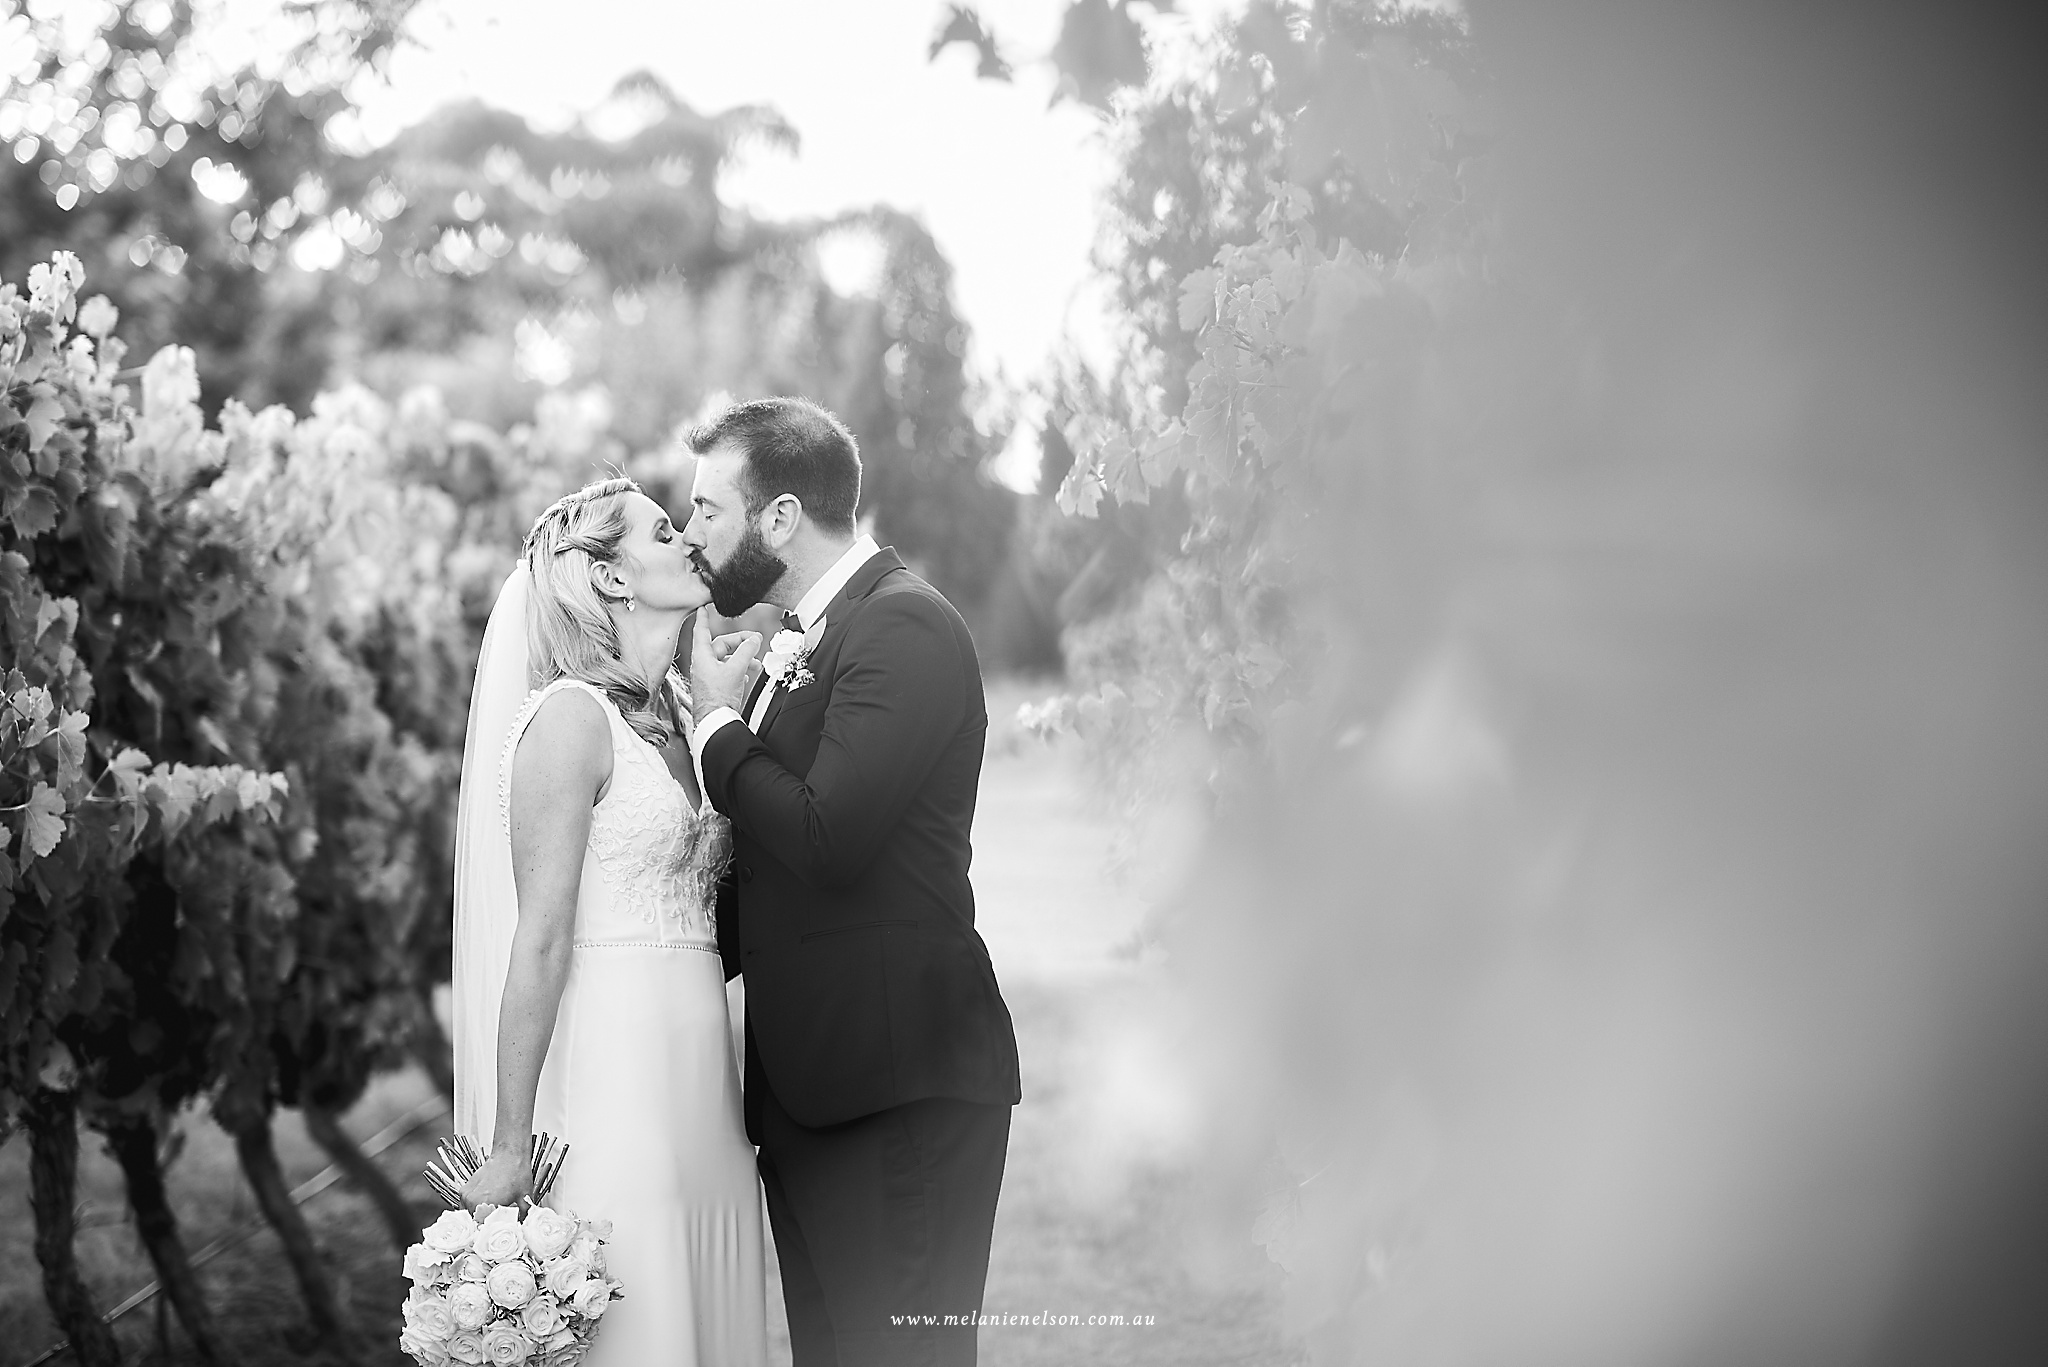 longview_vineyard_wedding_0075.jpg